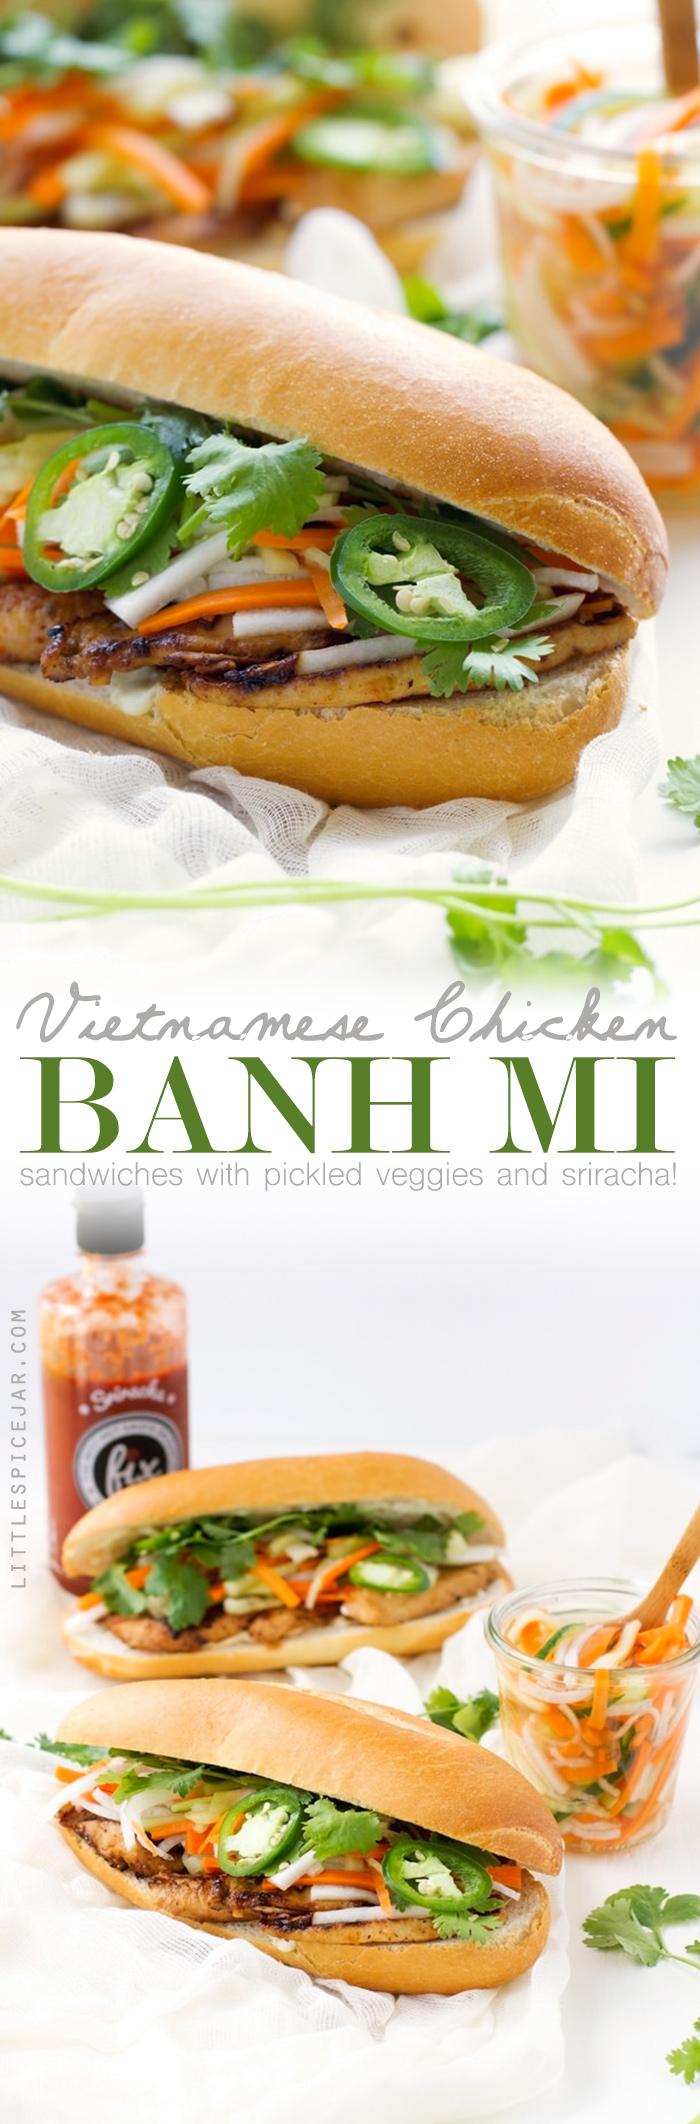 Vietnamese Chicken Sandwich (Banh Mi) - Learn how to make restaurant style BANH MI sandwiches at home! #banhmi #vietnamesesandwich #banhmisandwiches   Littlespicejar.com